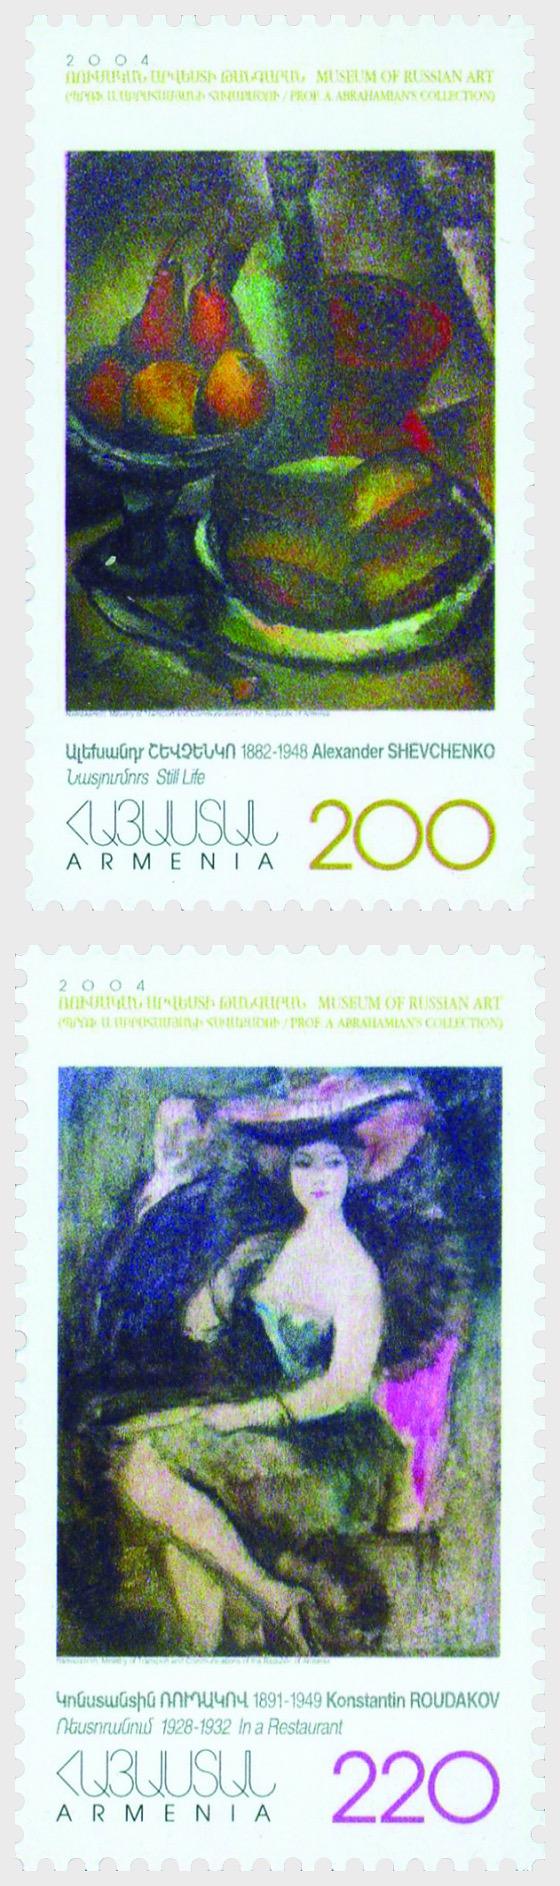 Museo de Arte Ruso - Konstantin Roudakov y Alexander Shevchenko - Series